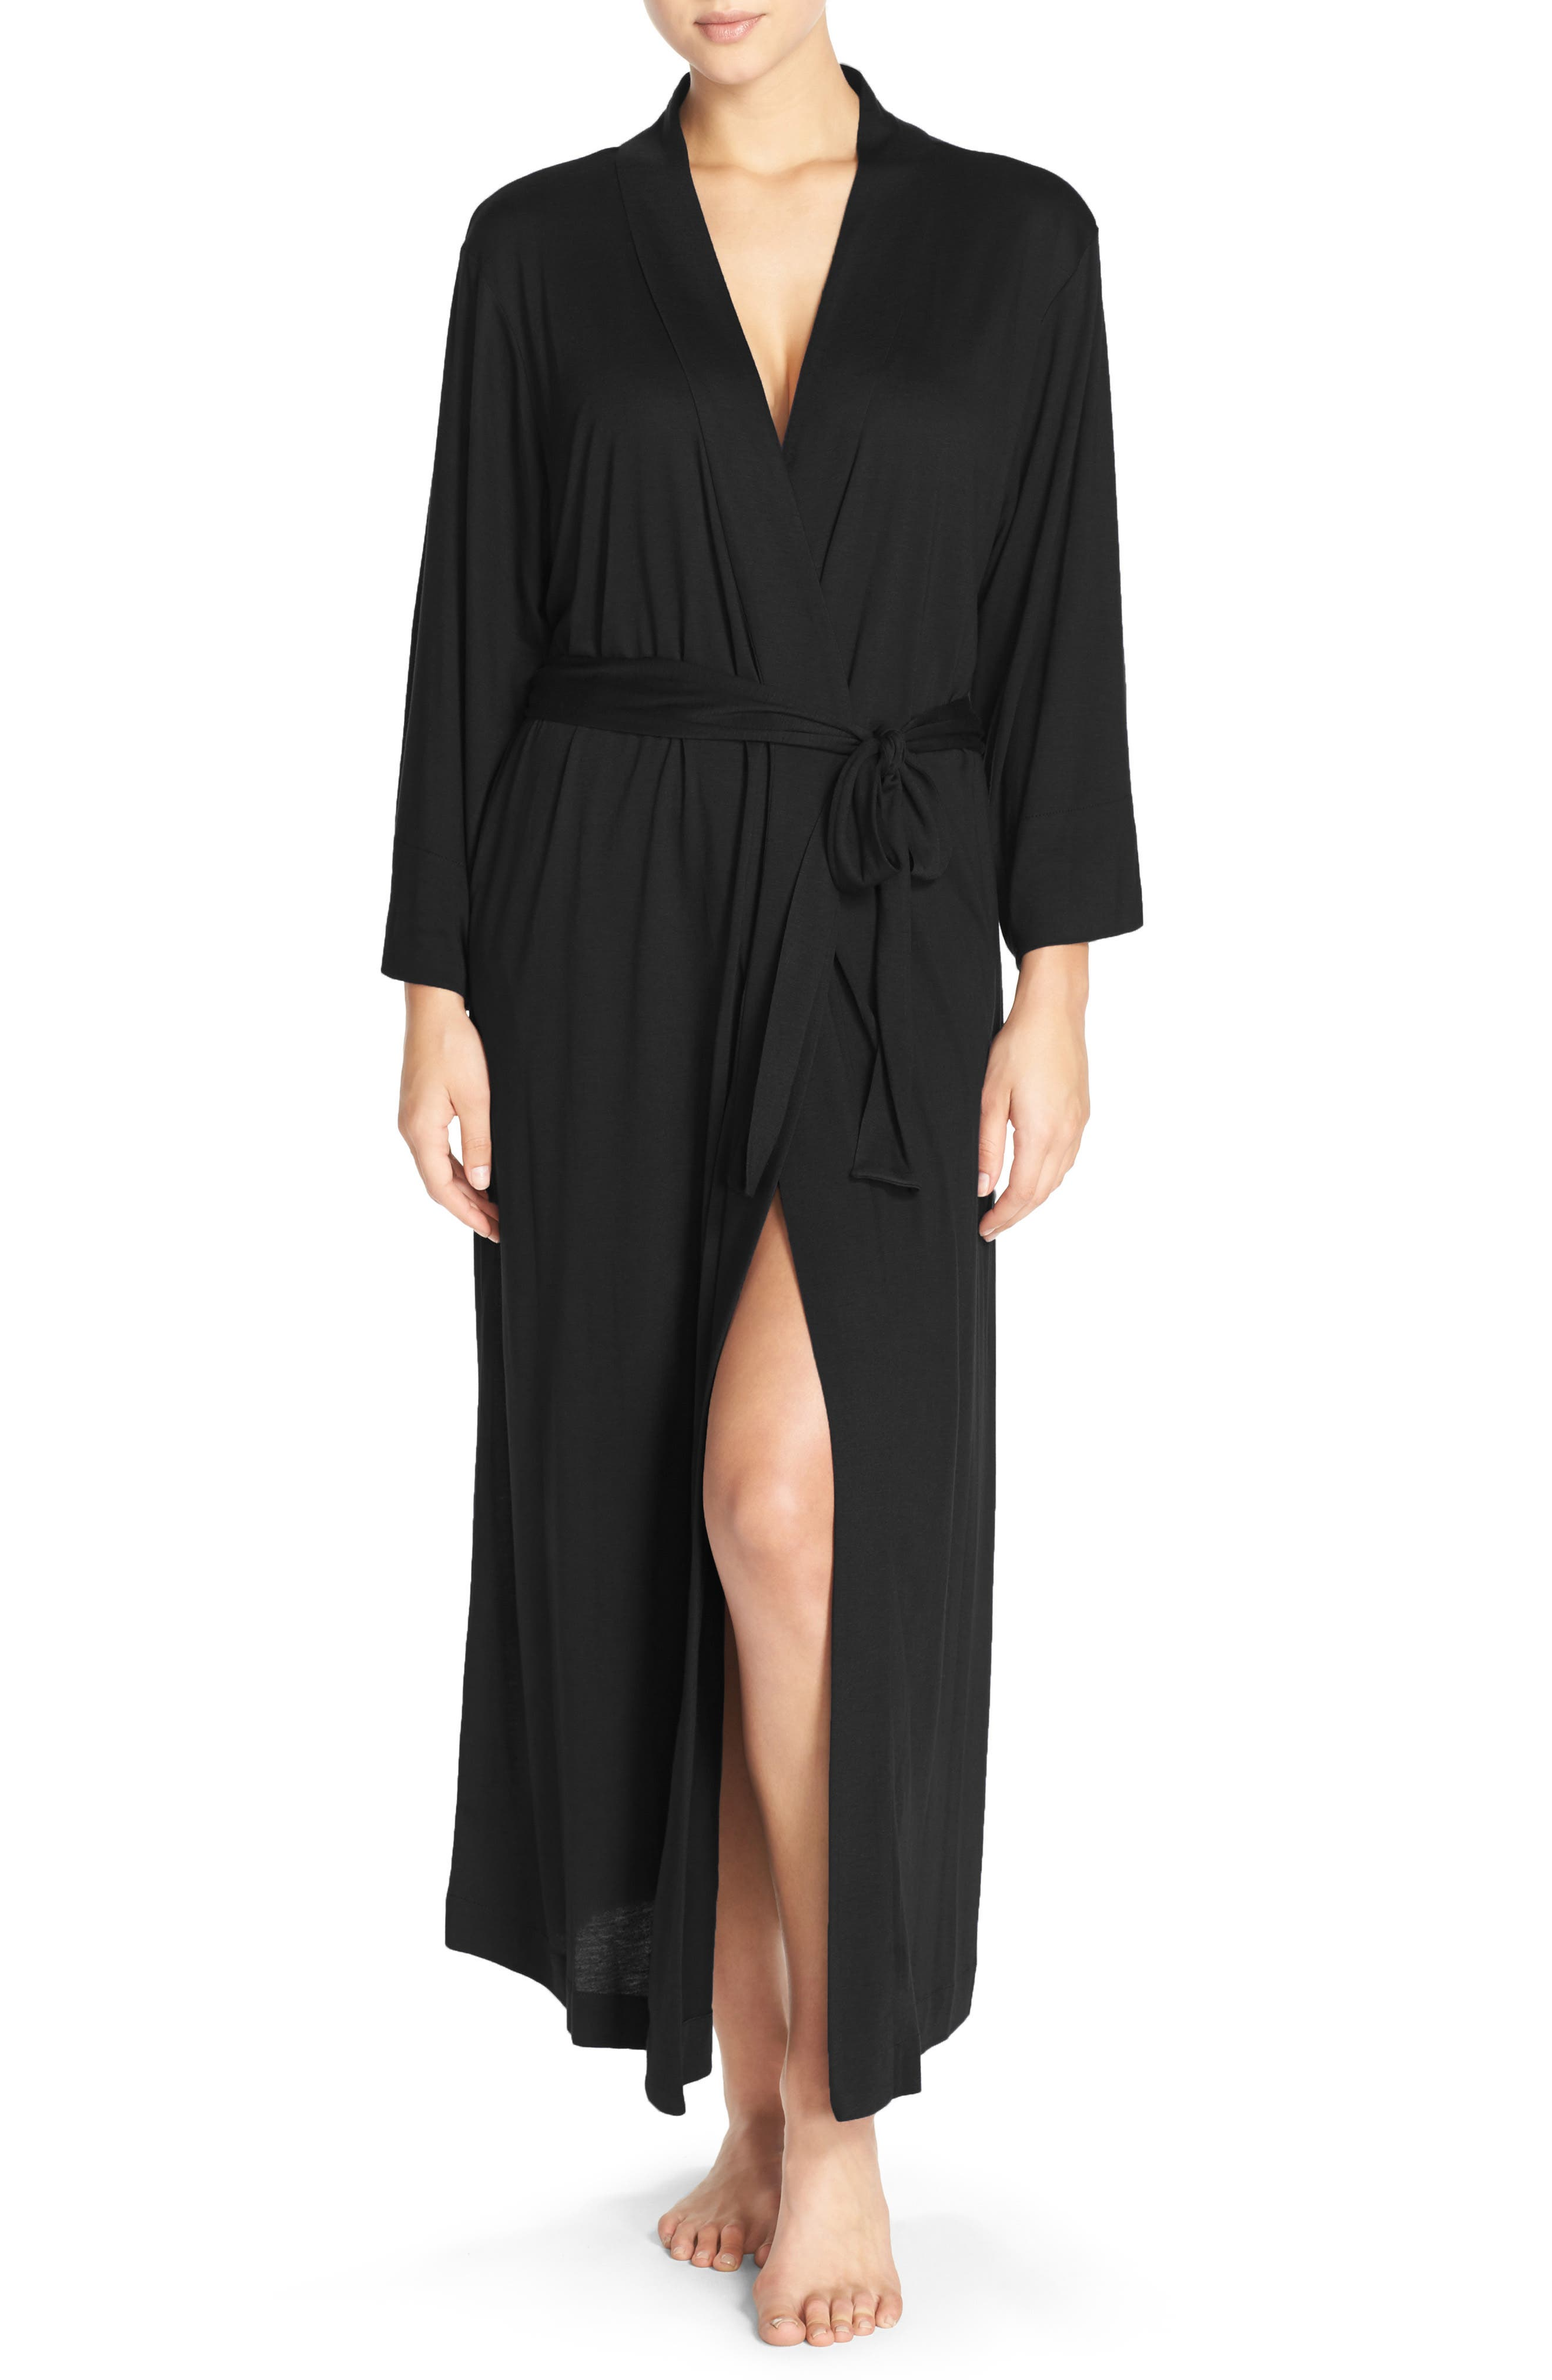 'Shangri-La' Robe,                         Main,                         color, Black